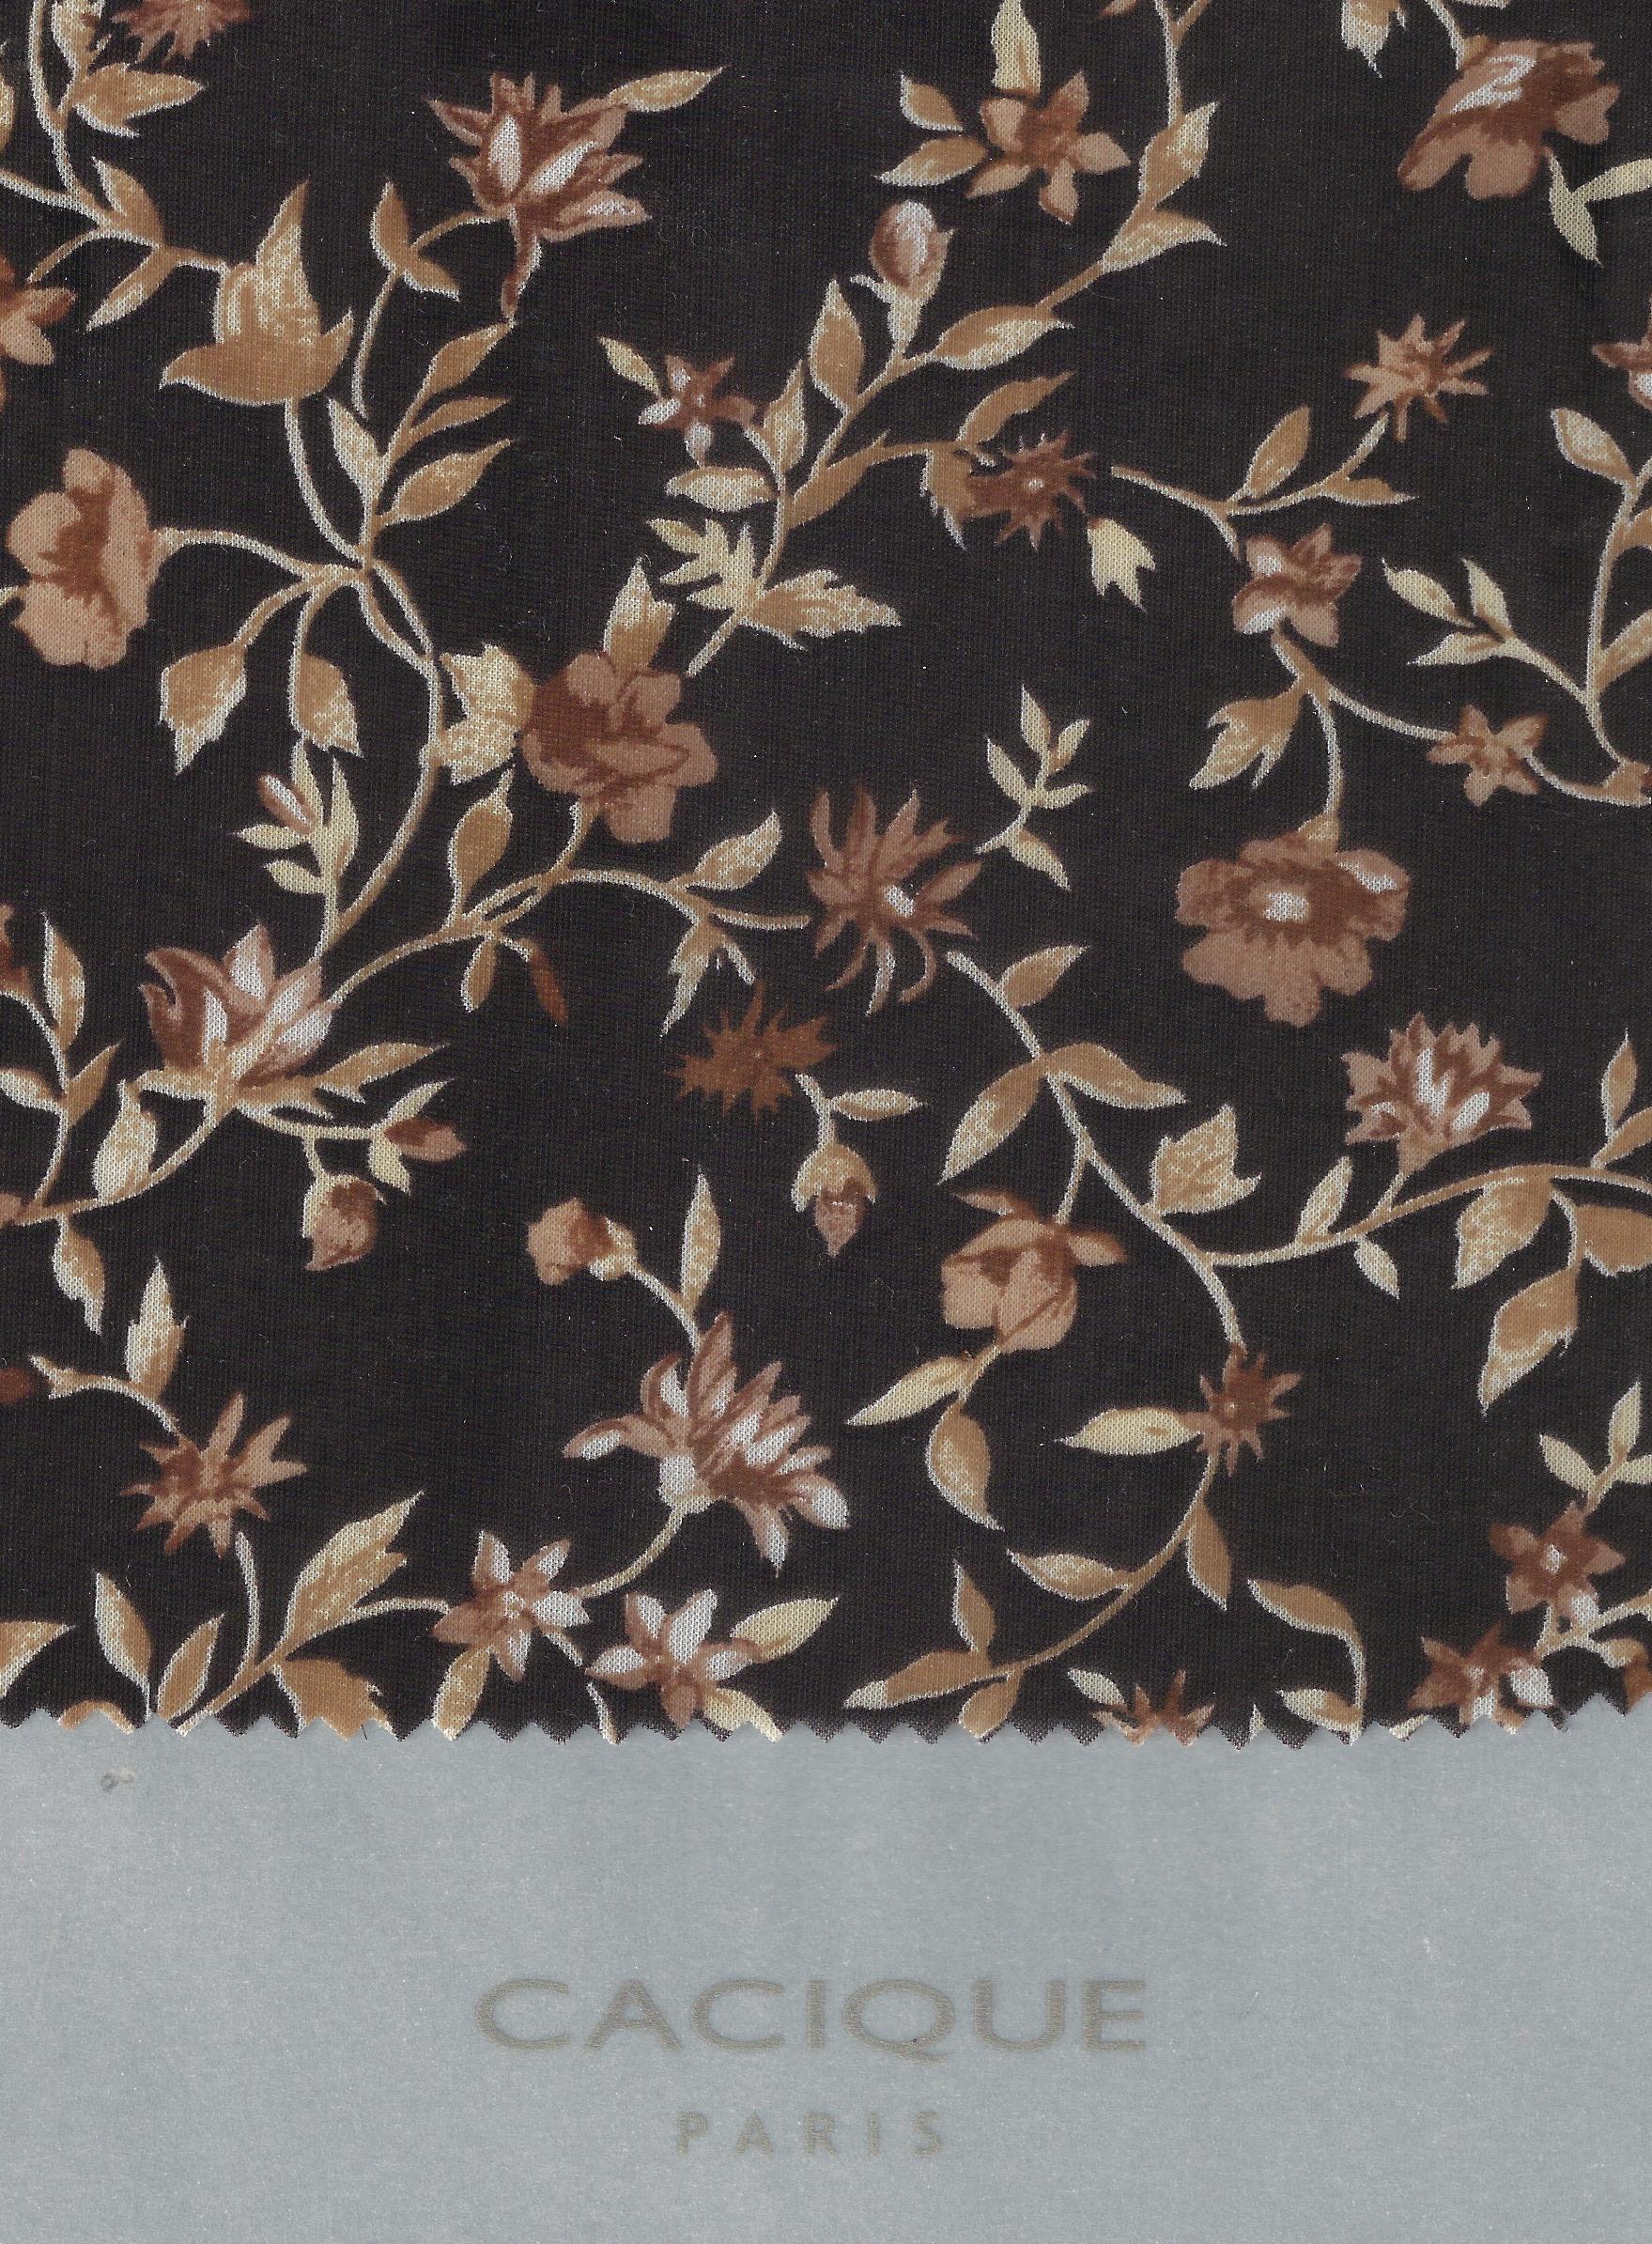 Cacique Sheer Floral Floral, Decor, Home decor